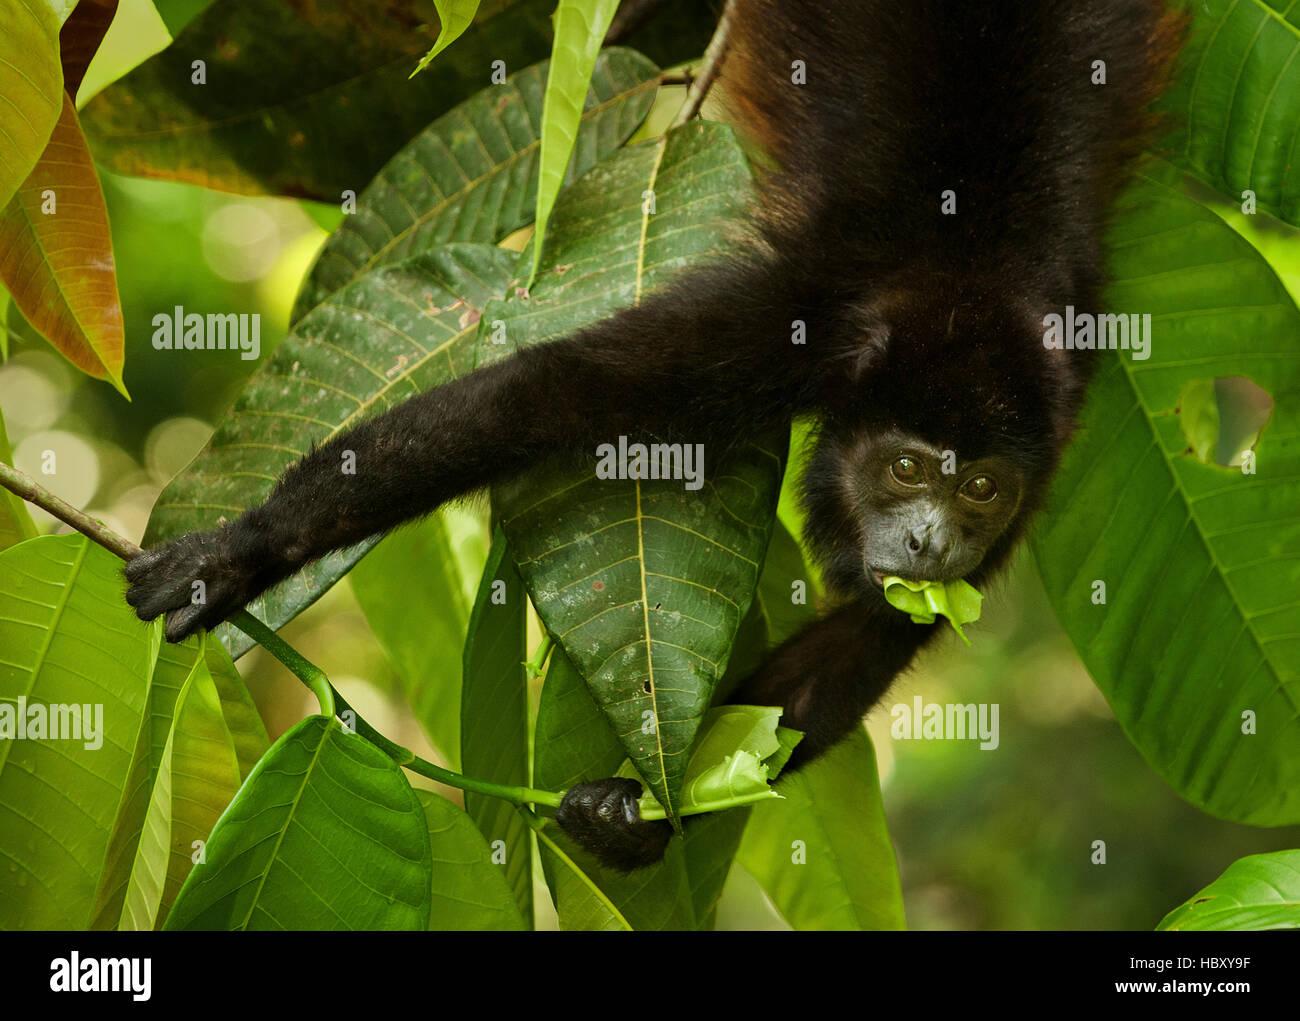 Mantled Howler Monkey (Alouatta palliata) eating a leaf, Costa Rica - Stock Image